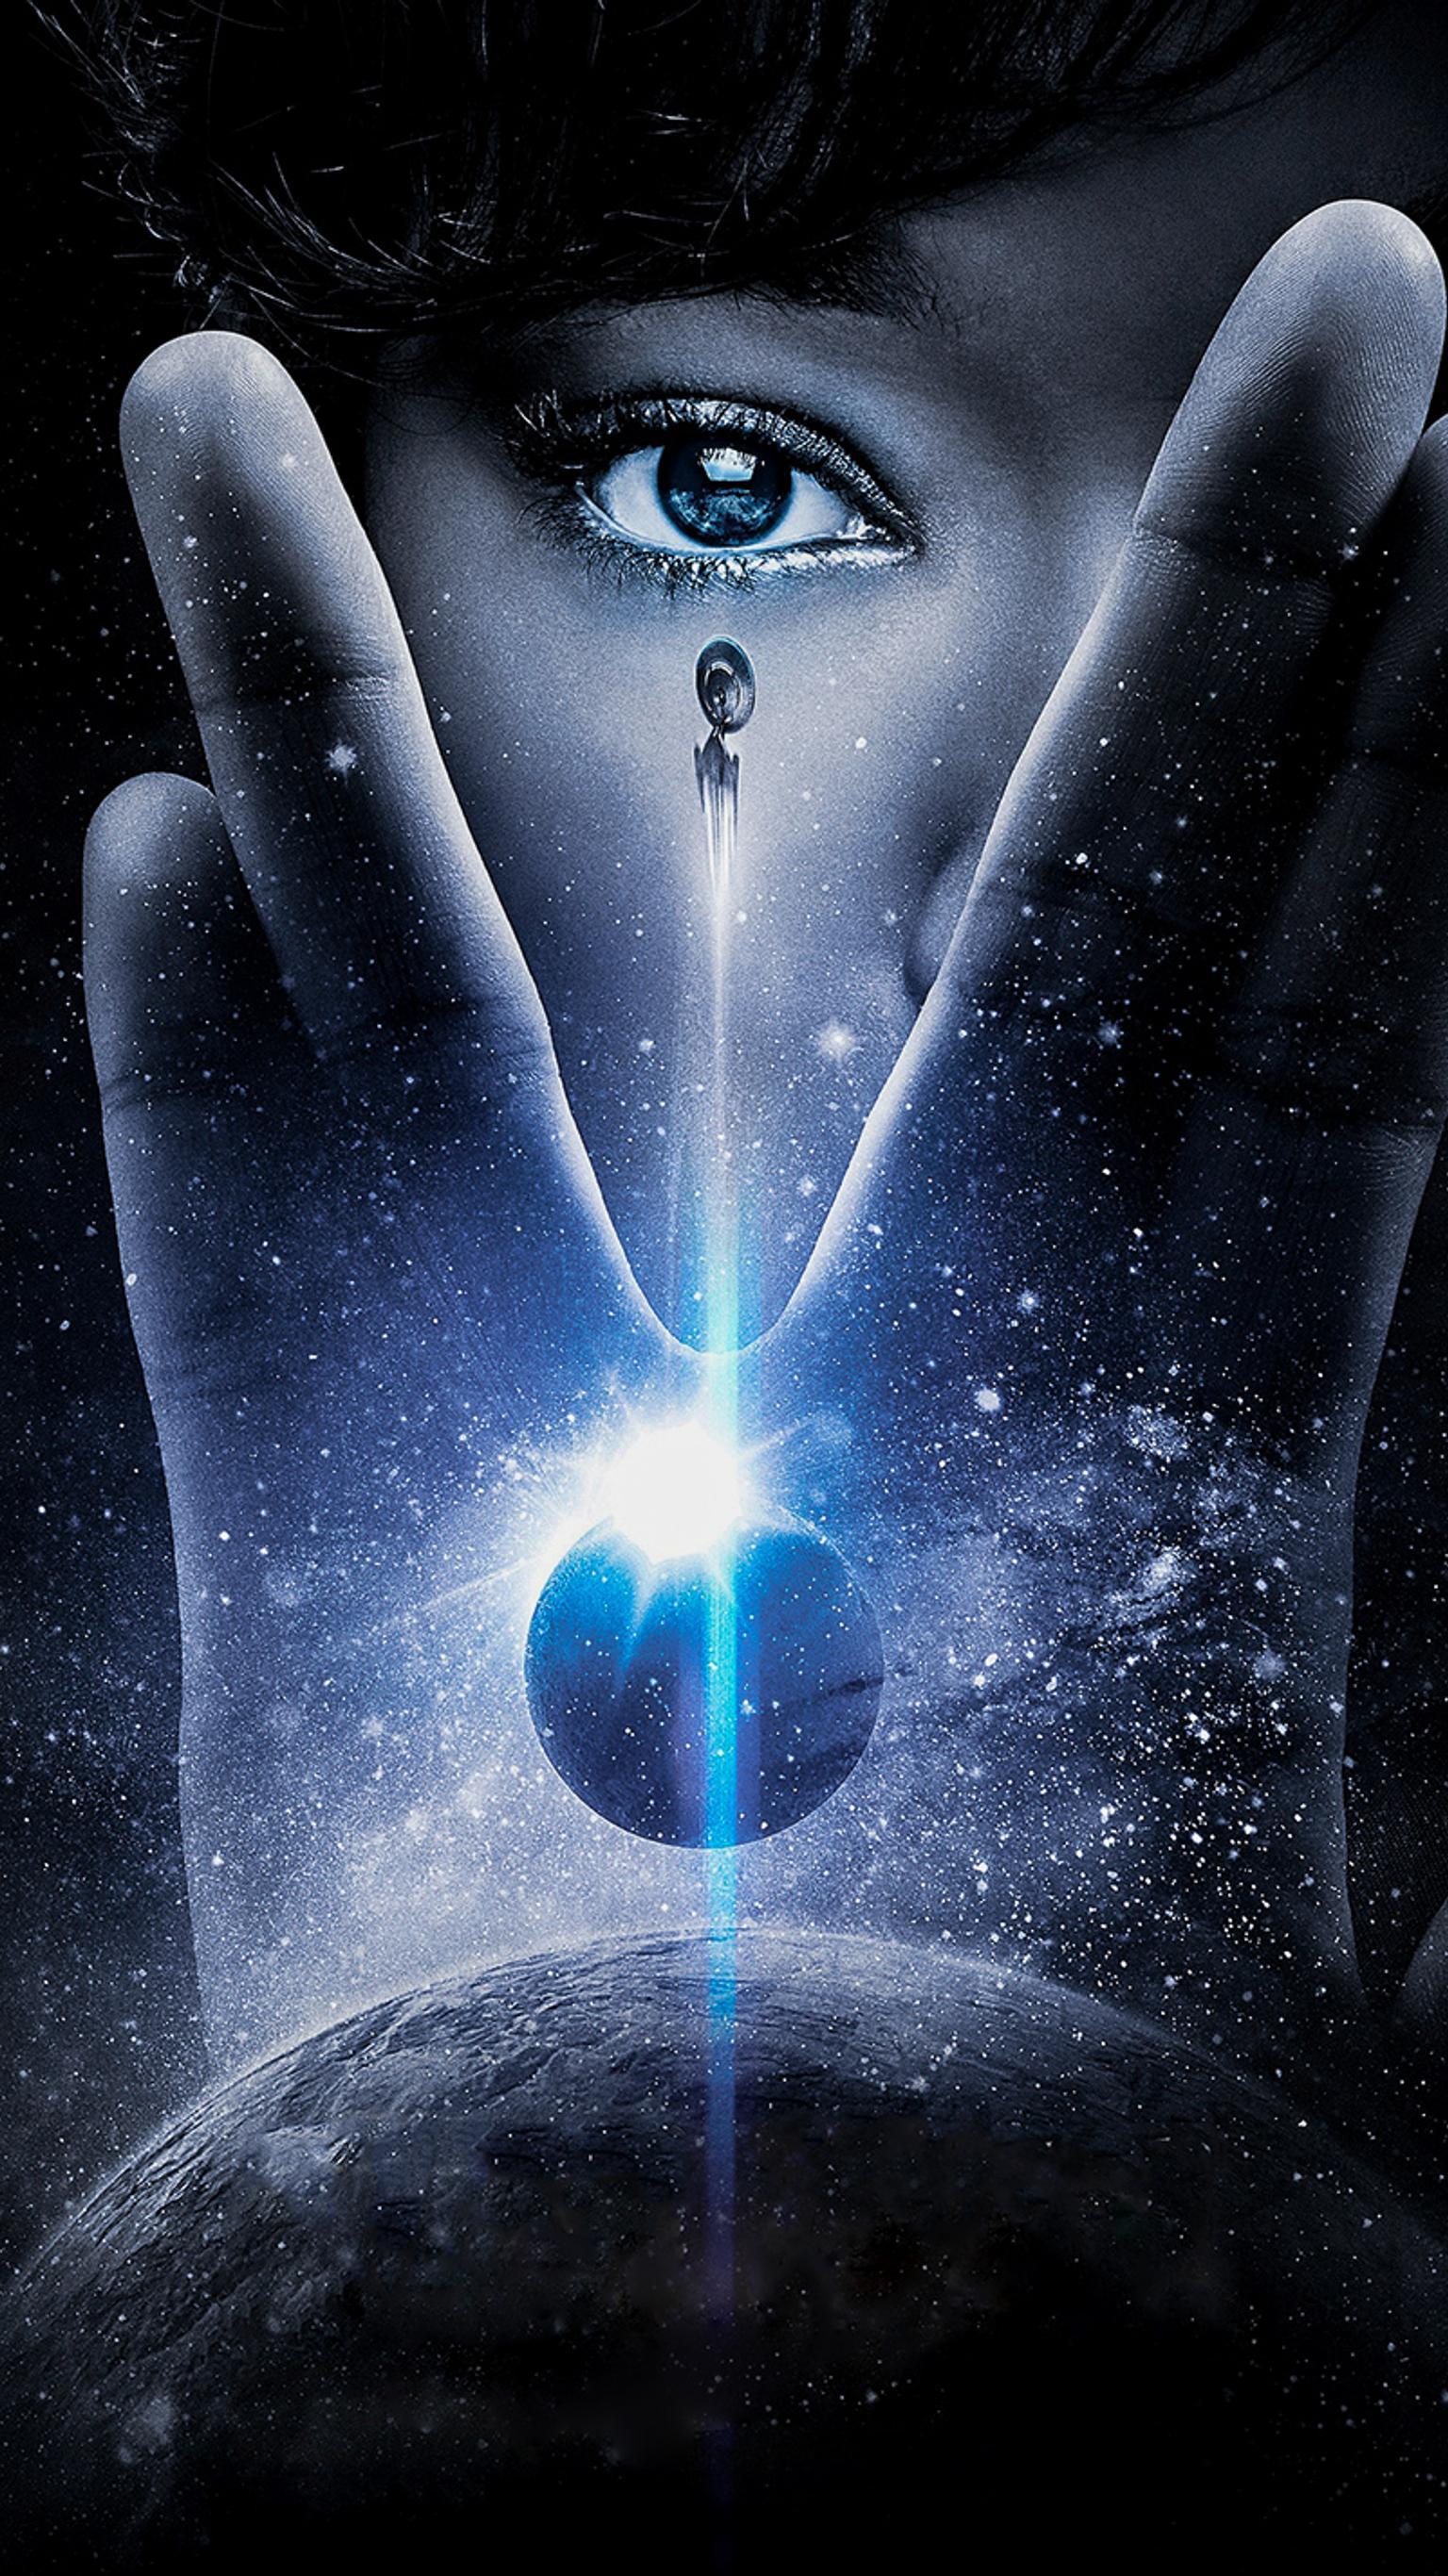 Free download Star Trek Discovery Phone Wallpaper ...